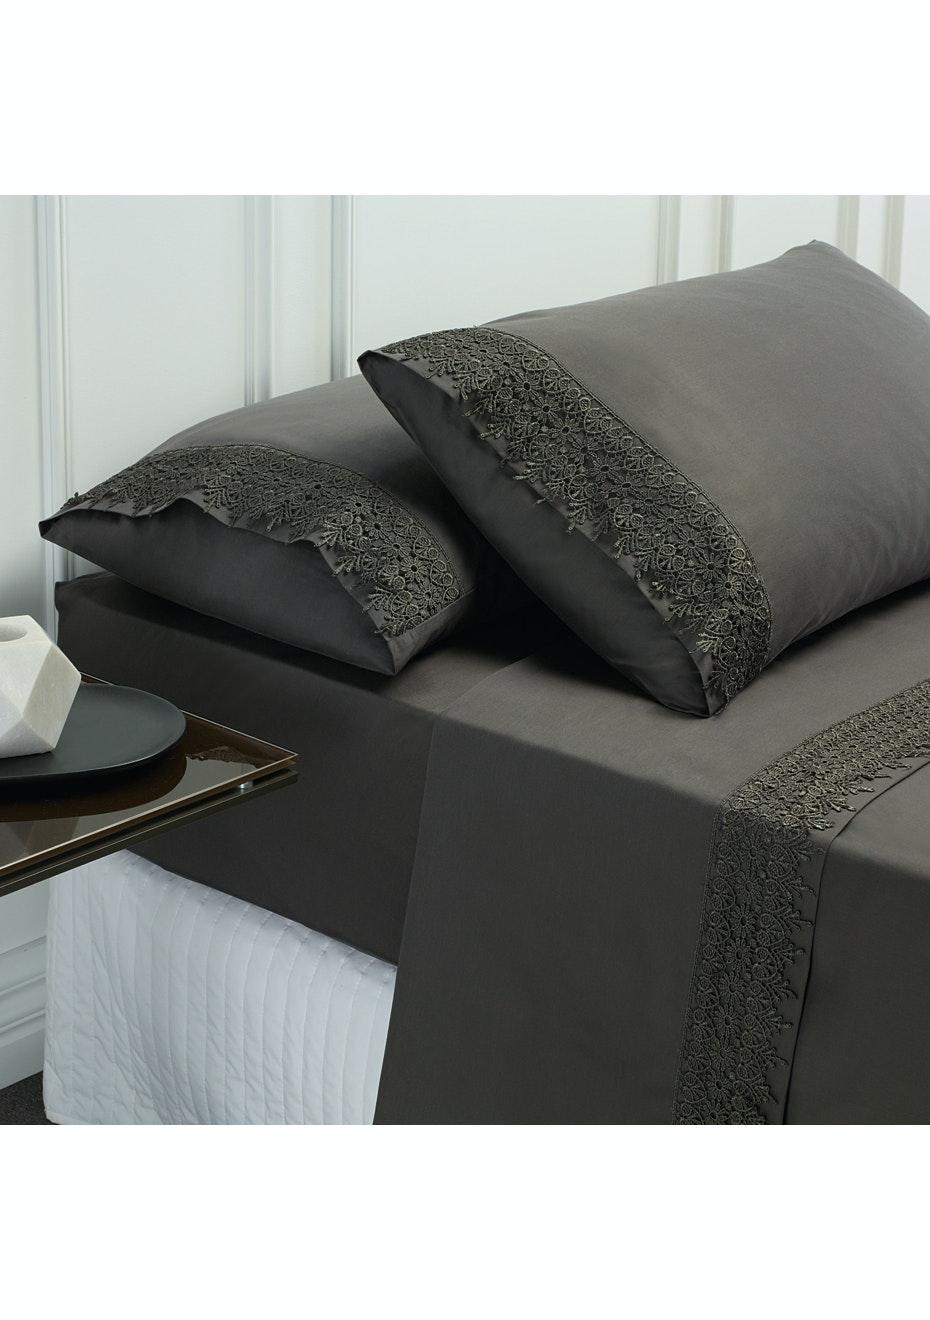 Style & Co 1000 Thread count Egyptian Cotton Hotel Collection Valencia Sheet sets Mega King Coal